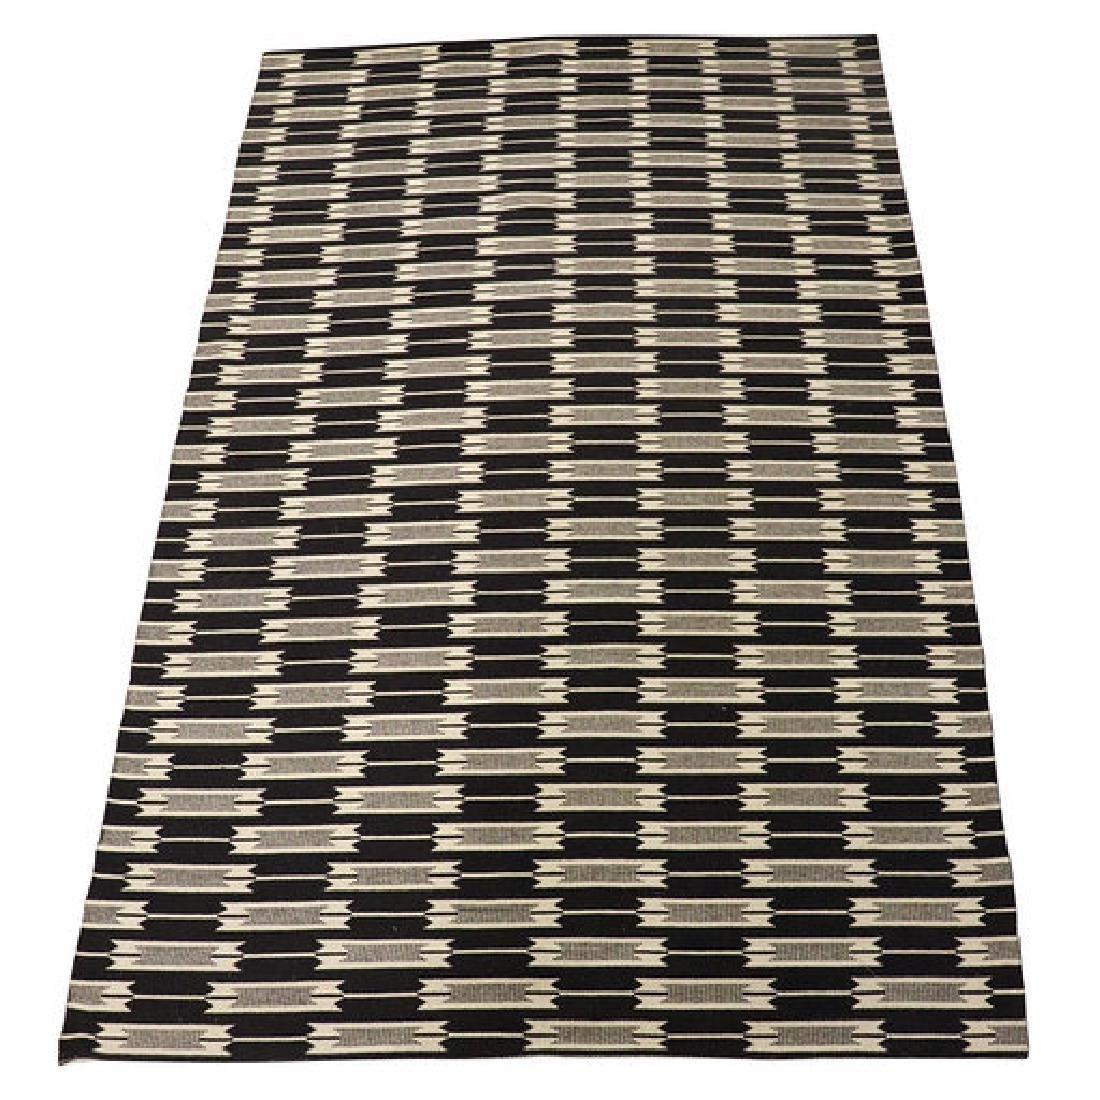 Native American Handwoven Rug Carpet